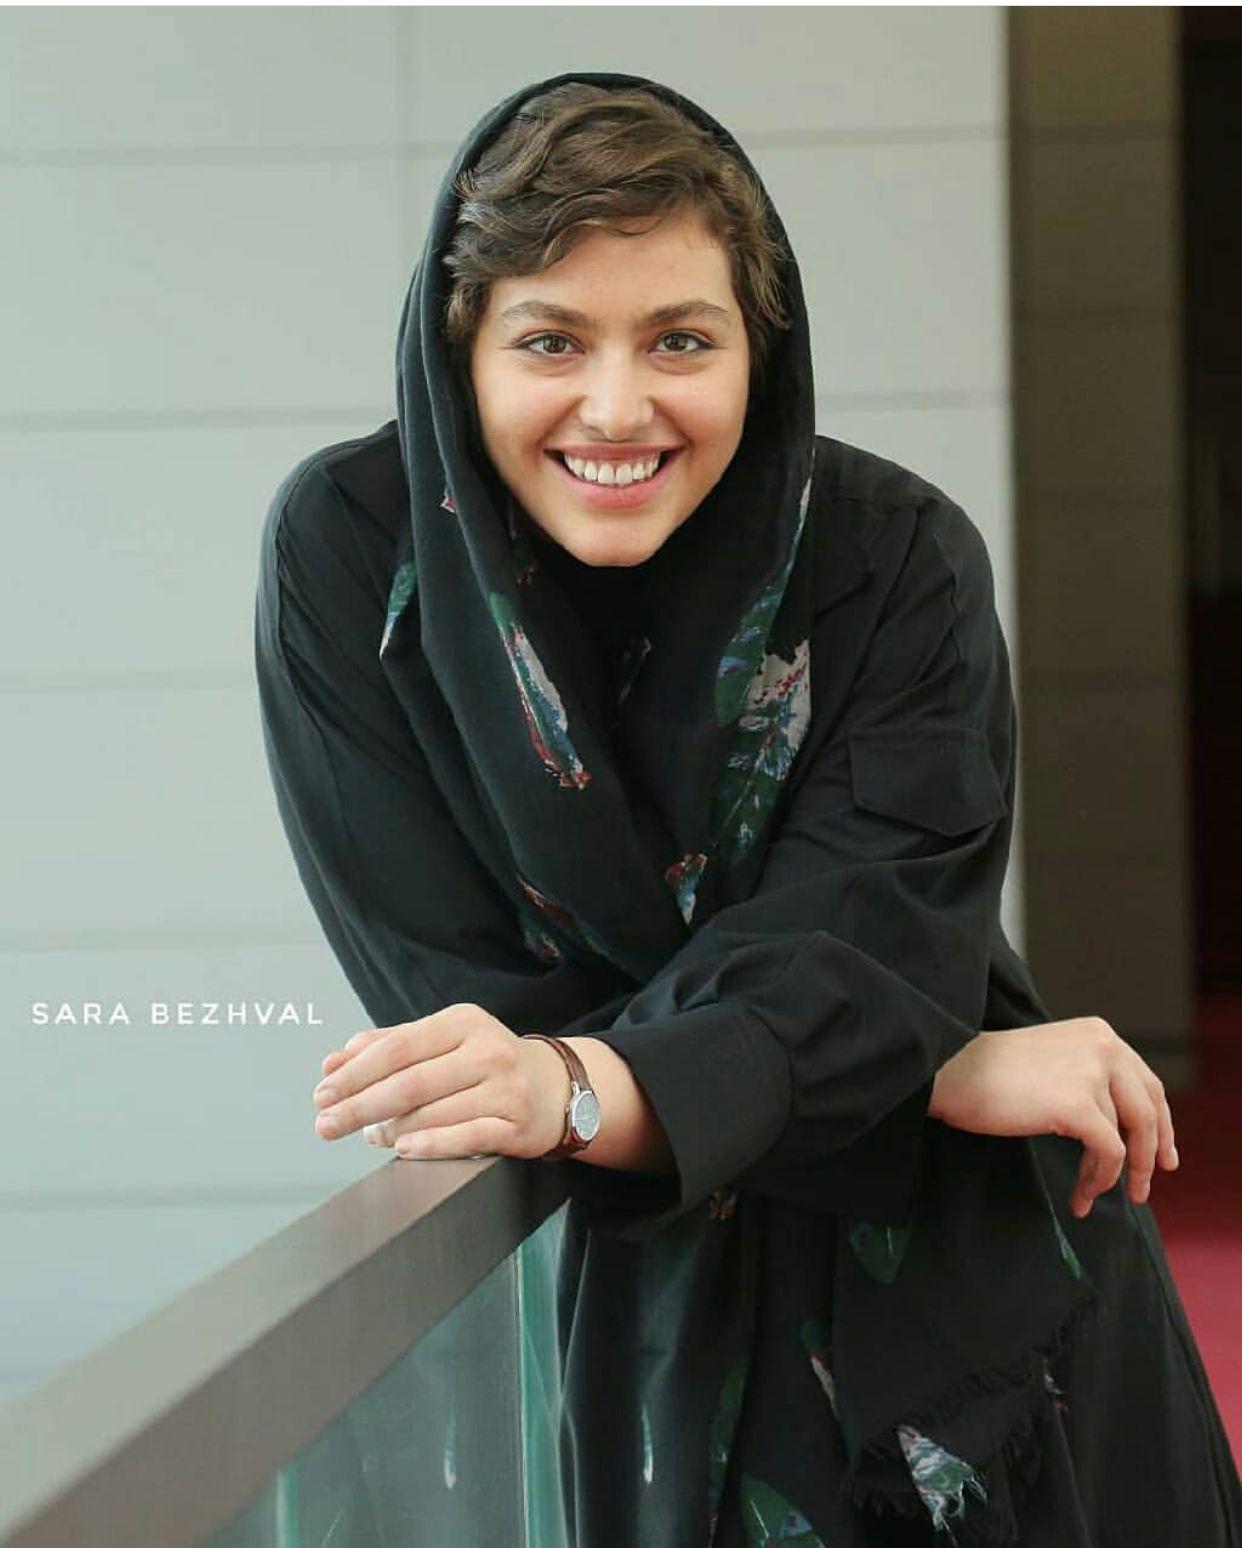 Reyhaneh Parsa 37 Fajr International Film Festival Iranian Actress ريحانه پارسا هنرمند سينما در سى Beautiful Muslim Women Beauty Full Girl Iranian Actors